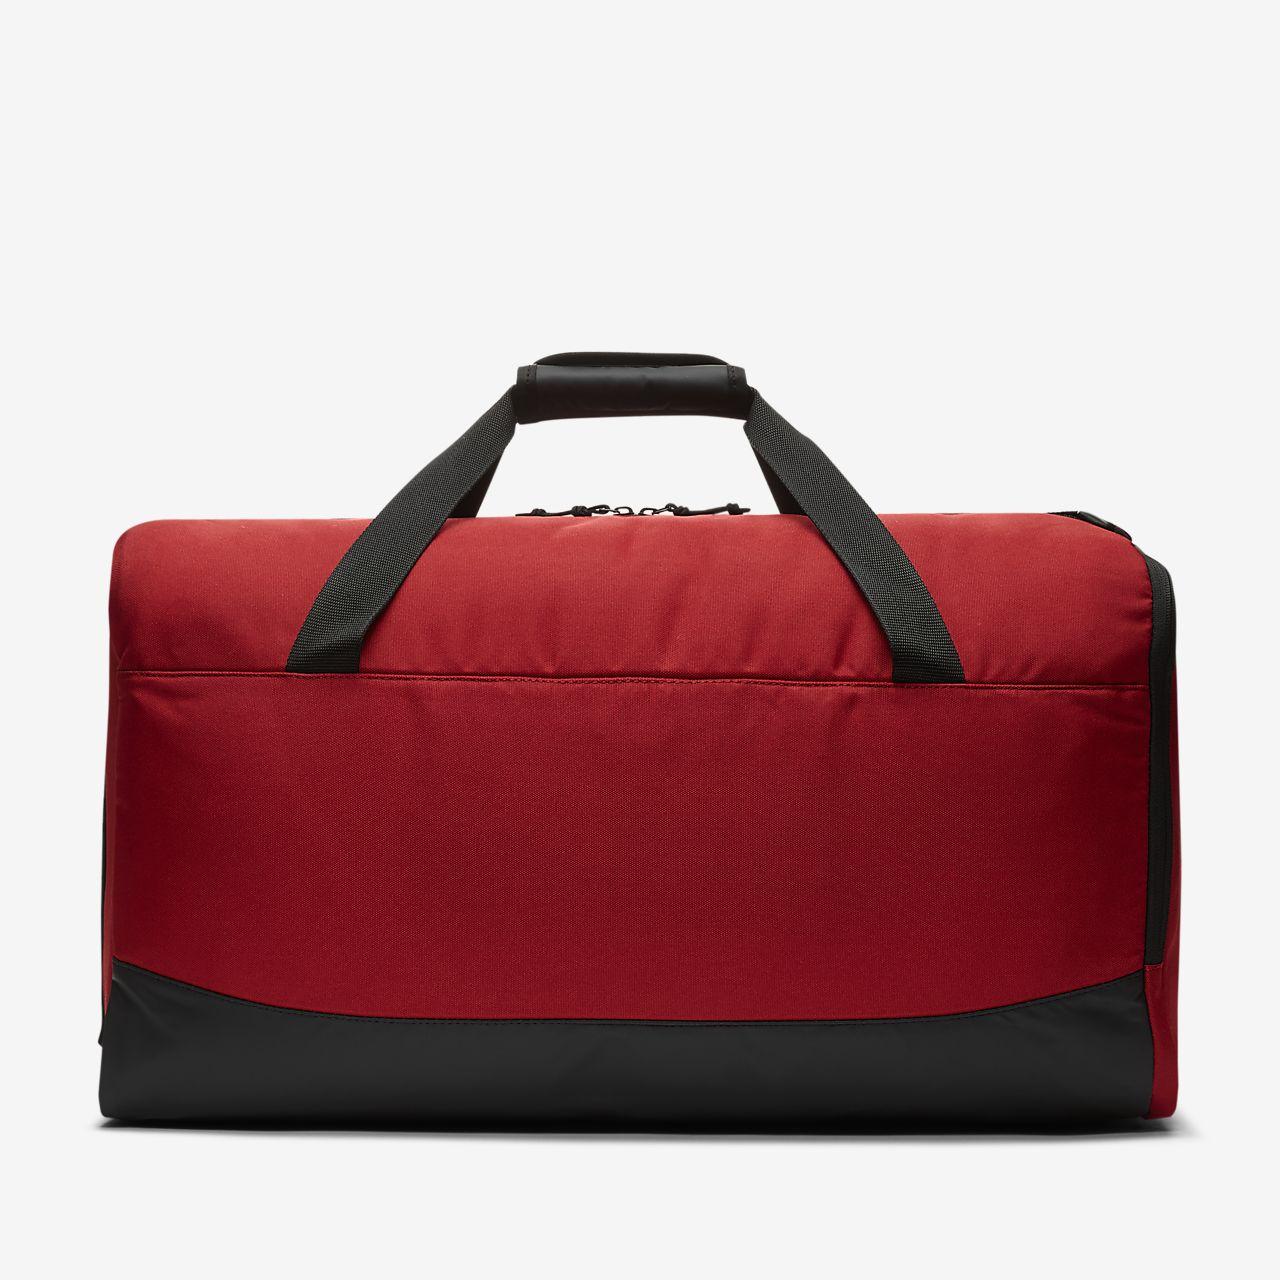 347f6058722 Low Resolution Jordan Jumpman Duffel Bag Jordan Jumpman Duffel Bag